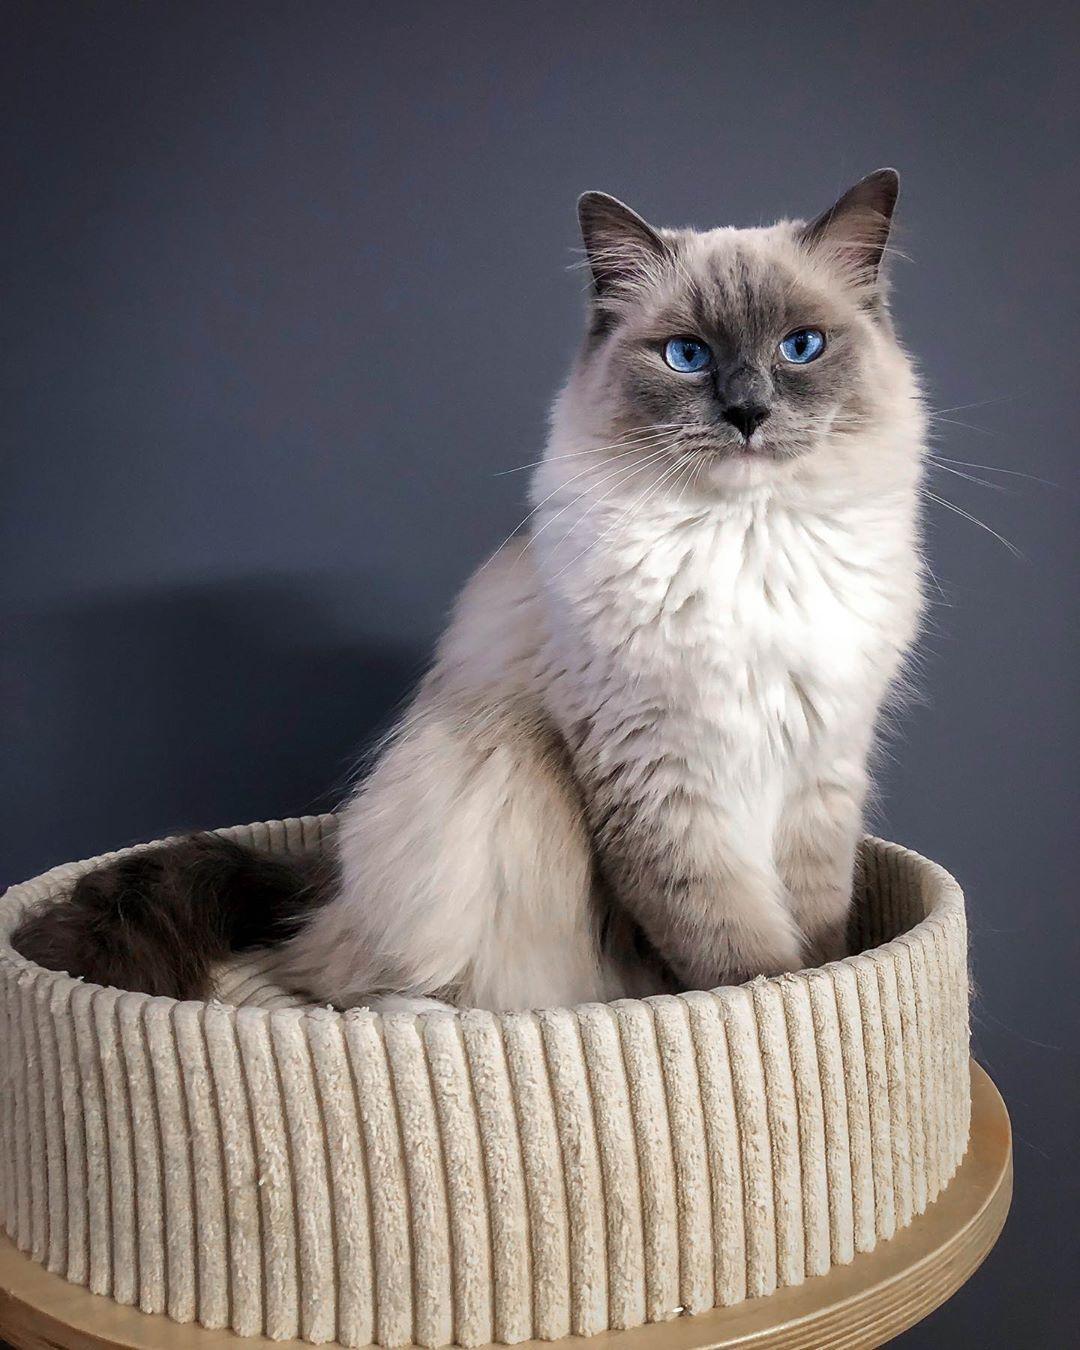 My Sweetheart Is Turning 2 Happy Birthday Lambert Cat Cats Catsofinstagram Cats Of Instagram Cats Of Fluffy Kittens Cat Day Ragdoll Kitten